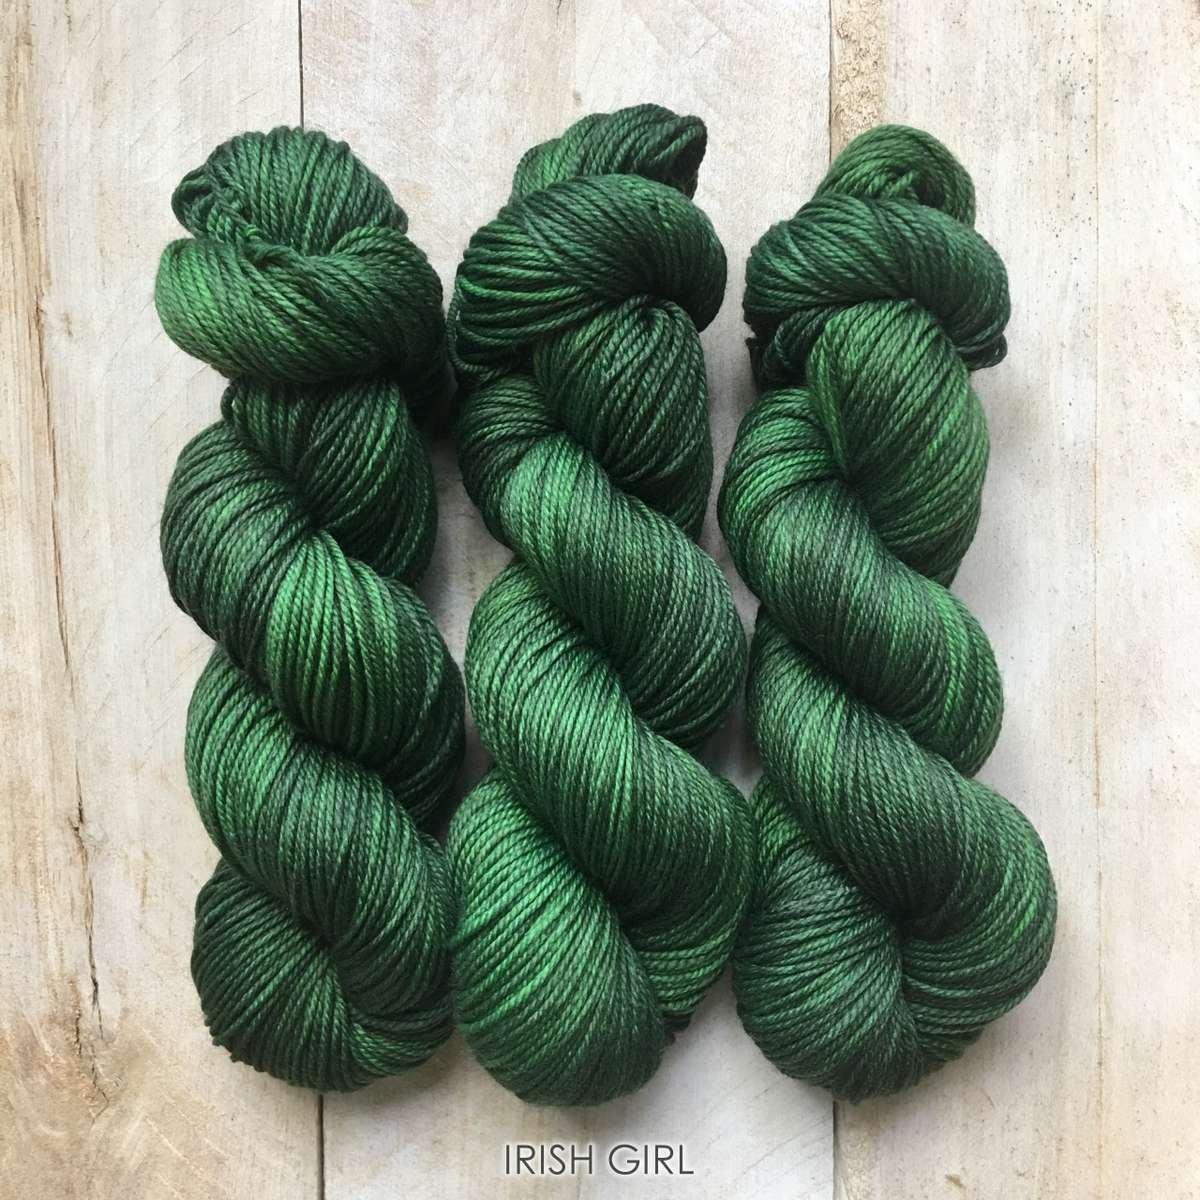 Hand-dyed yarn Louise Robert Irish Girl